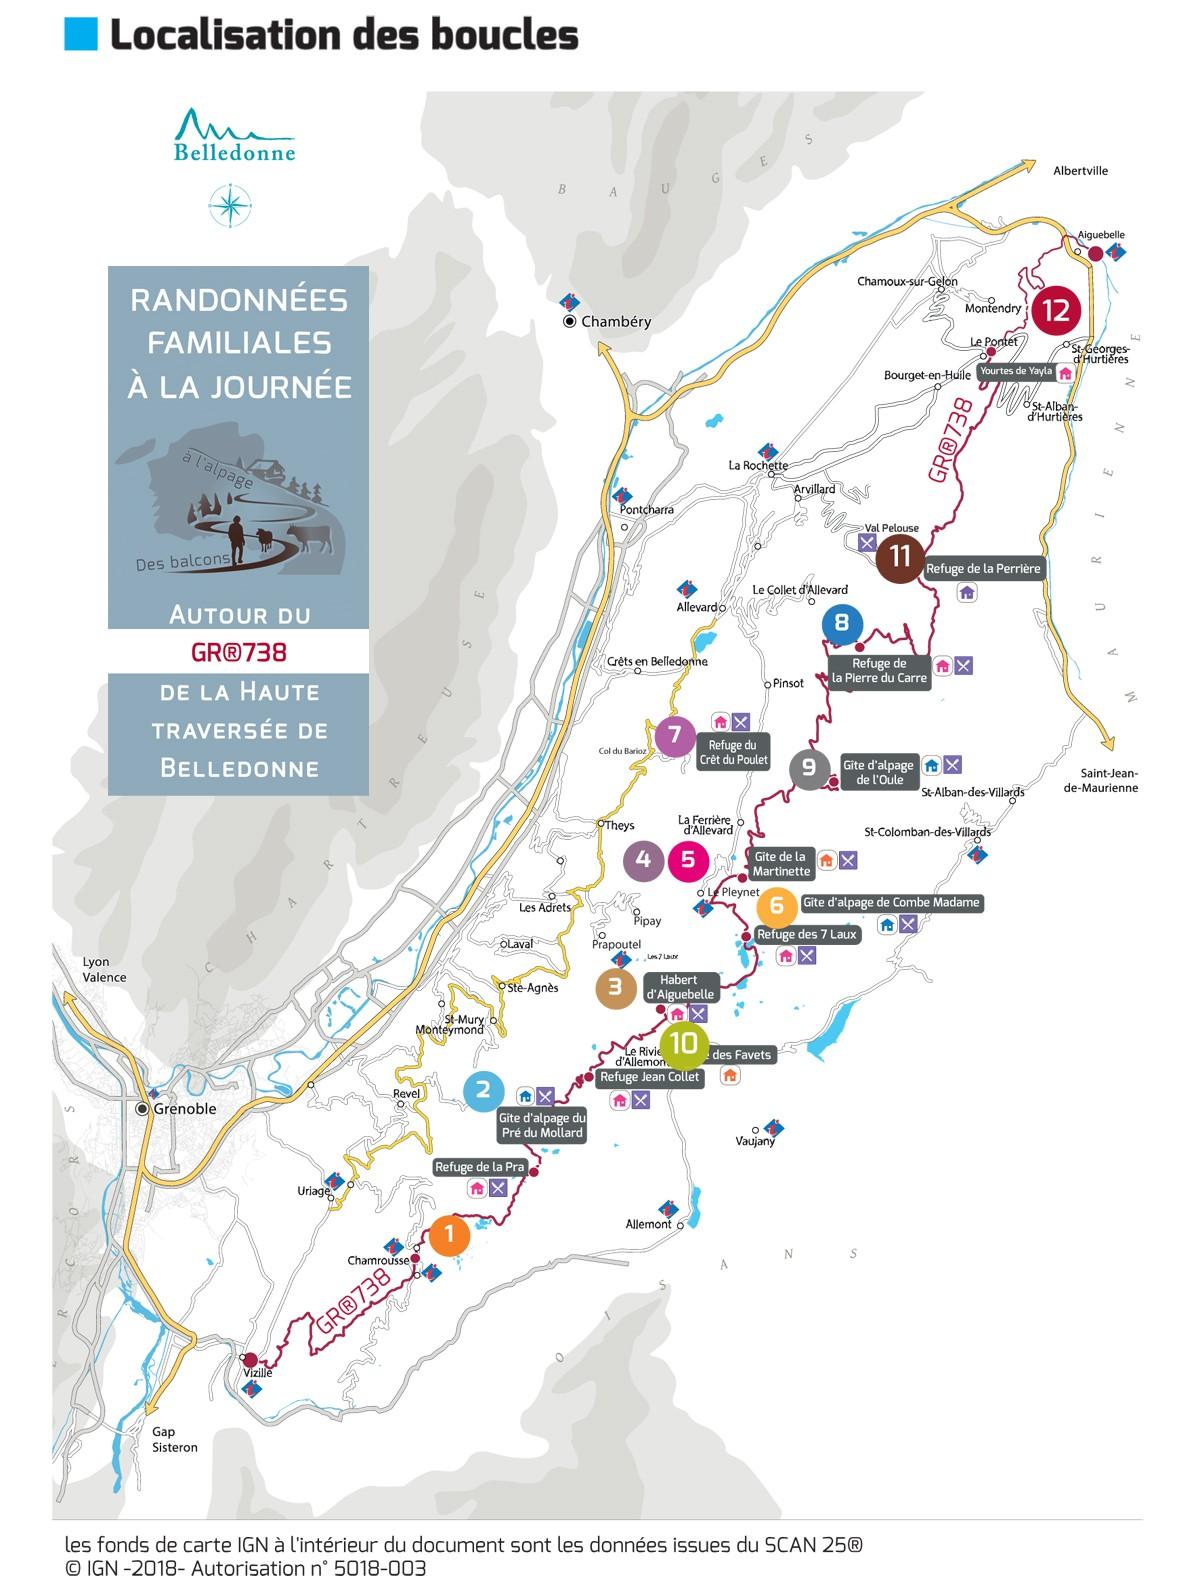 Chamrousse GR738 haute traversee belledonne station ete randonnee balade isere alpes france